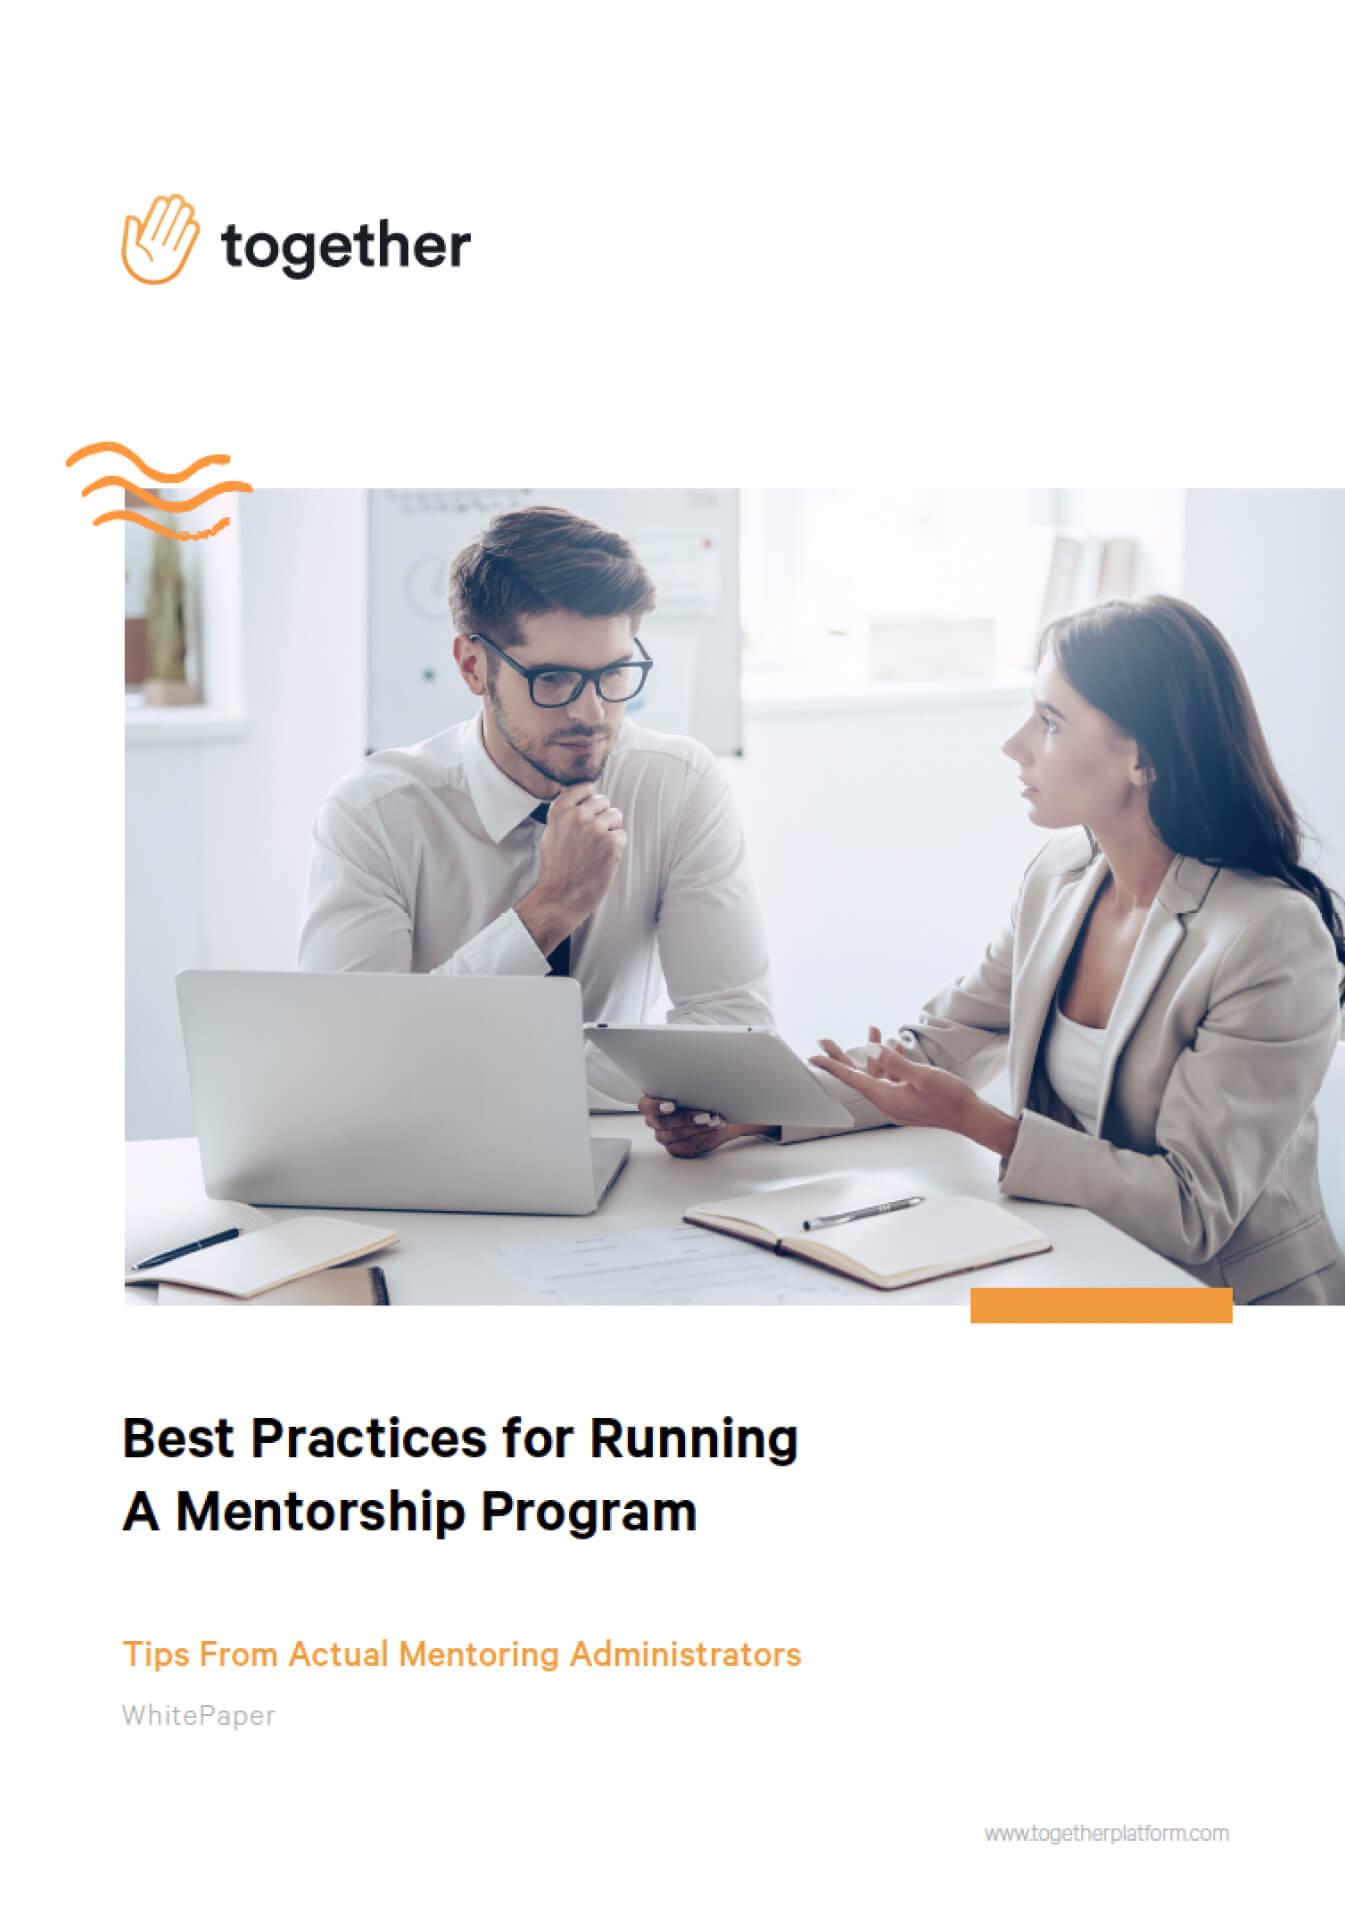 Best Practices for Running A Mentorship Program